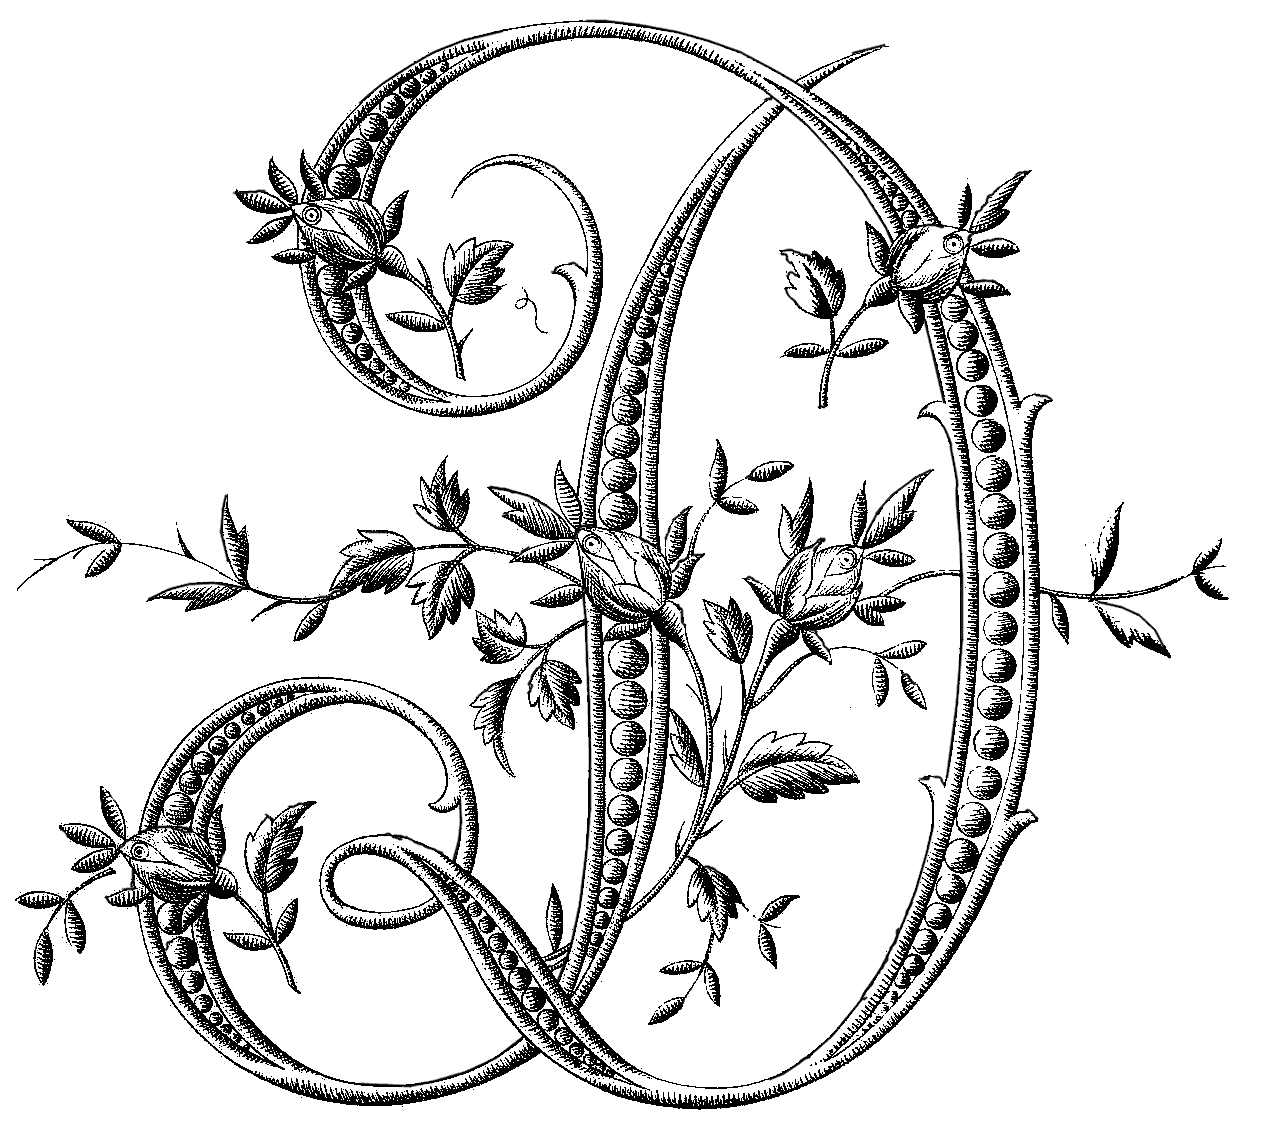 Pin de LoicandLydia Dufresne de Virel en Calligraphy | Pinterest ...